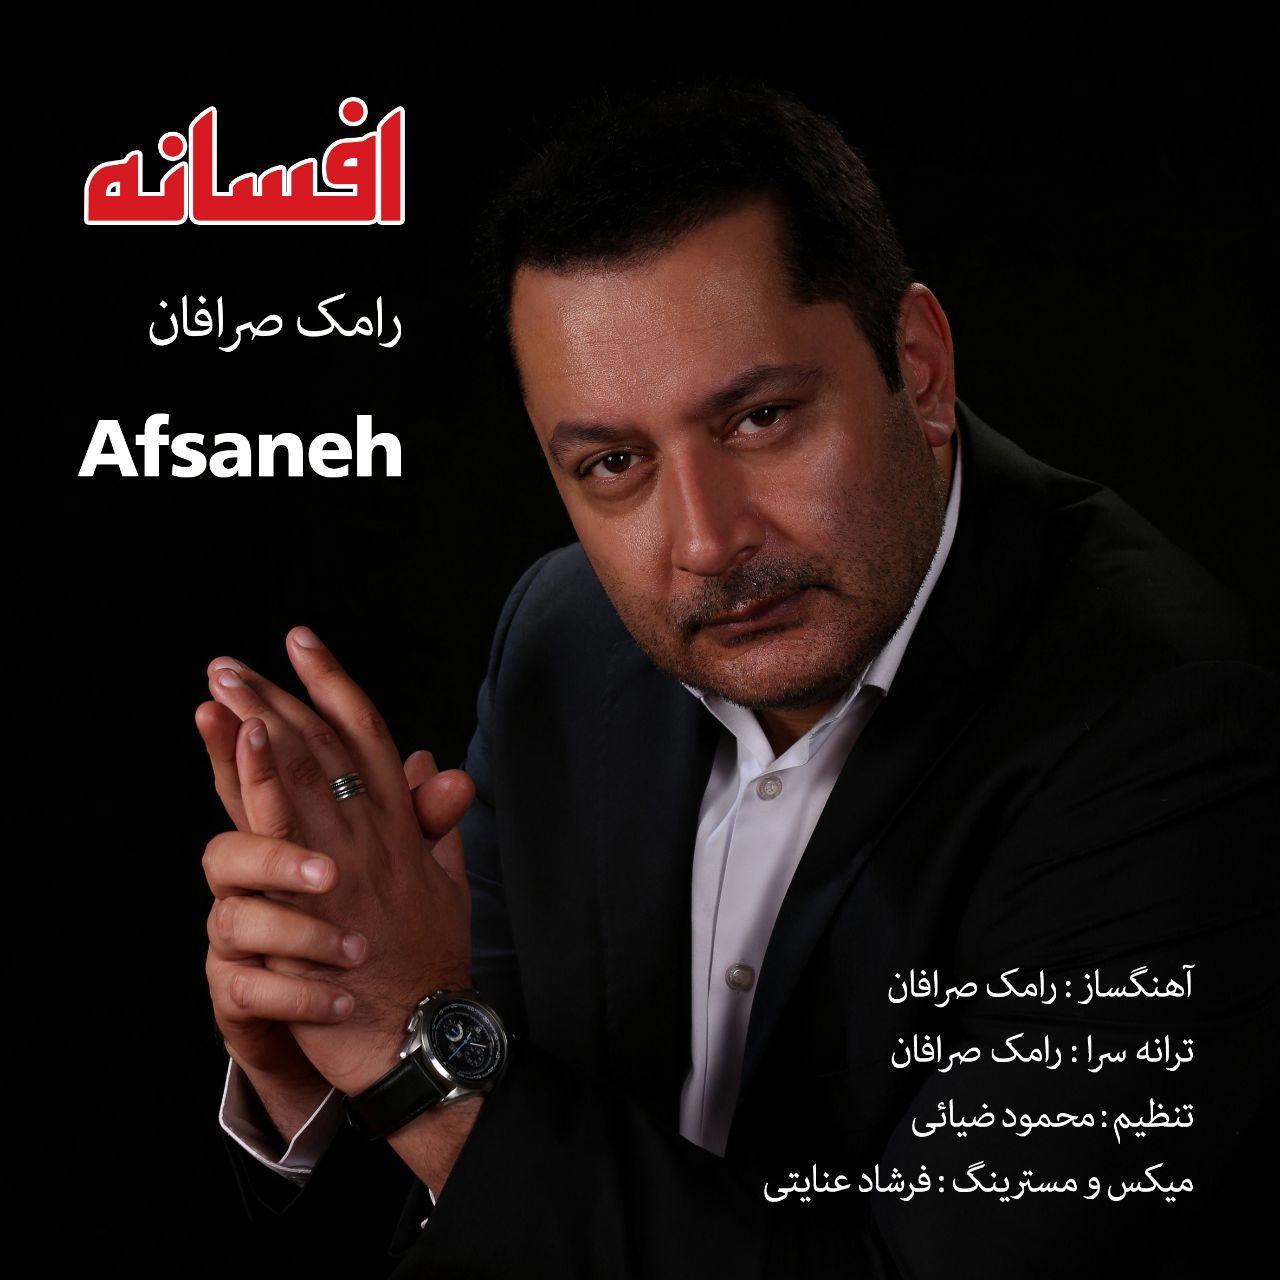 http://dl.rasanejavan.com/radio97/06/15/Ramak%20Sarrafan%20-%20Afsaneh.jpg